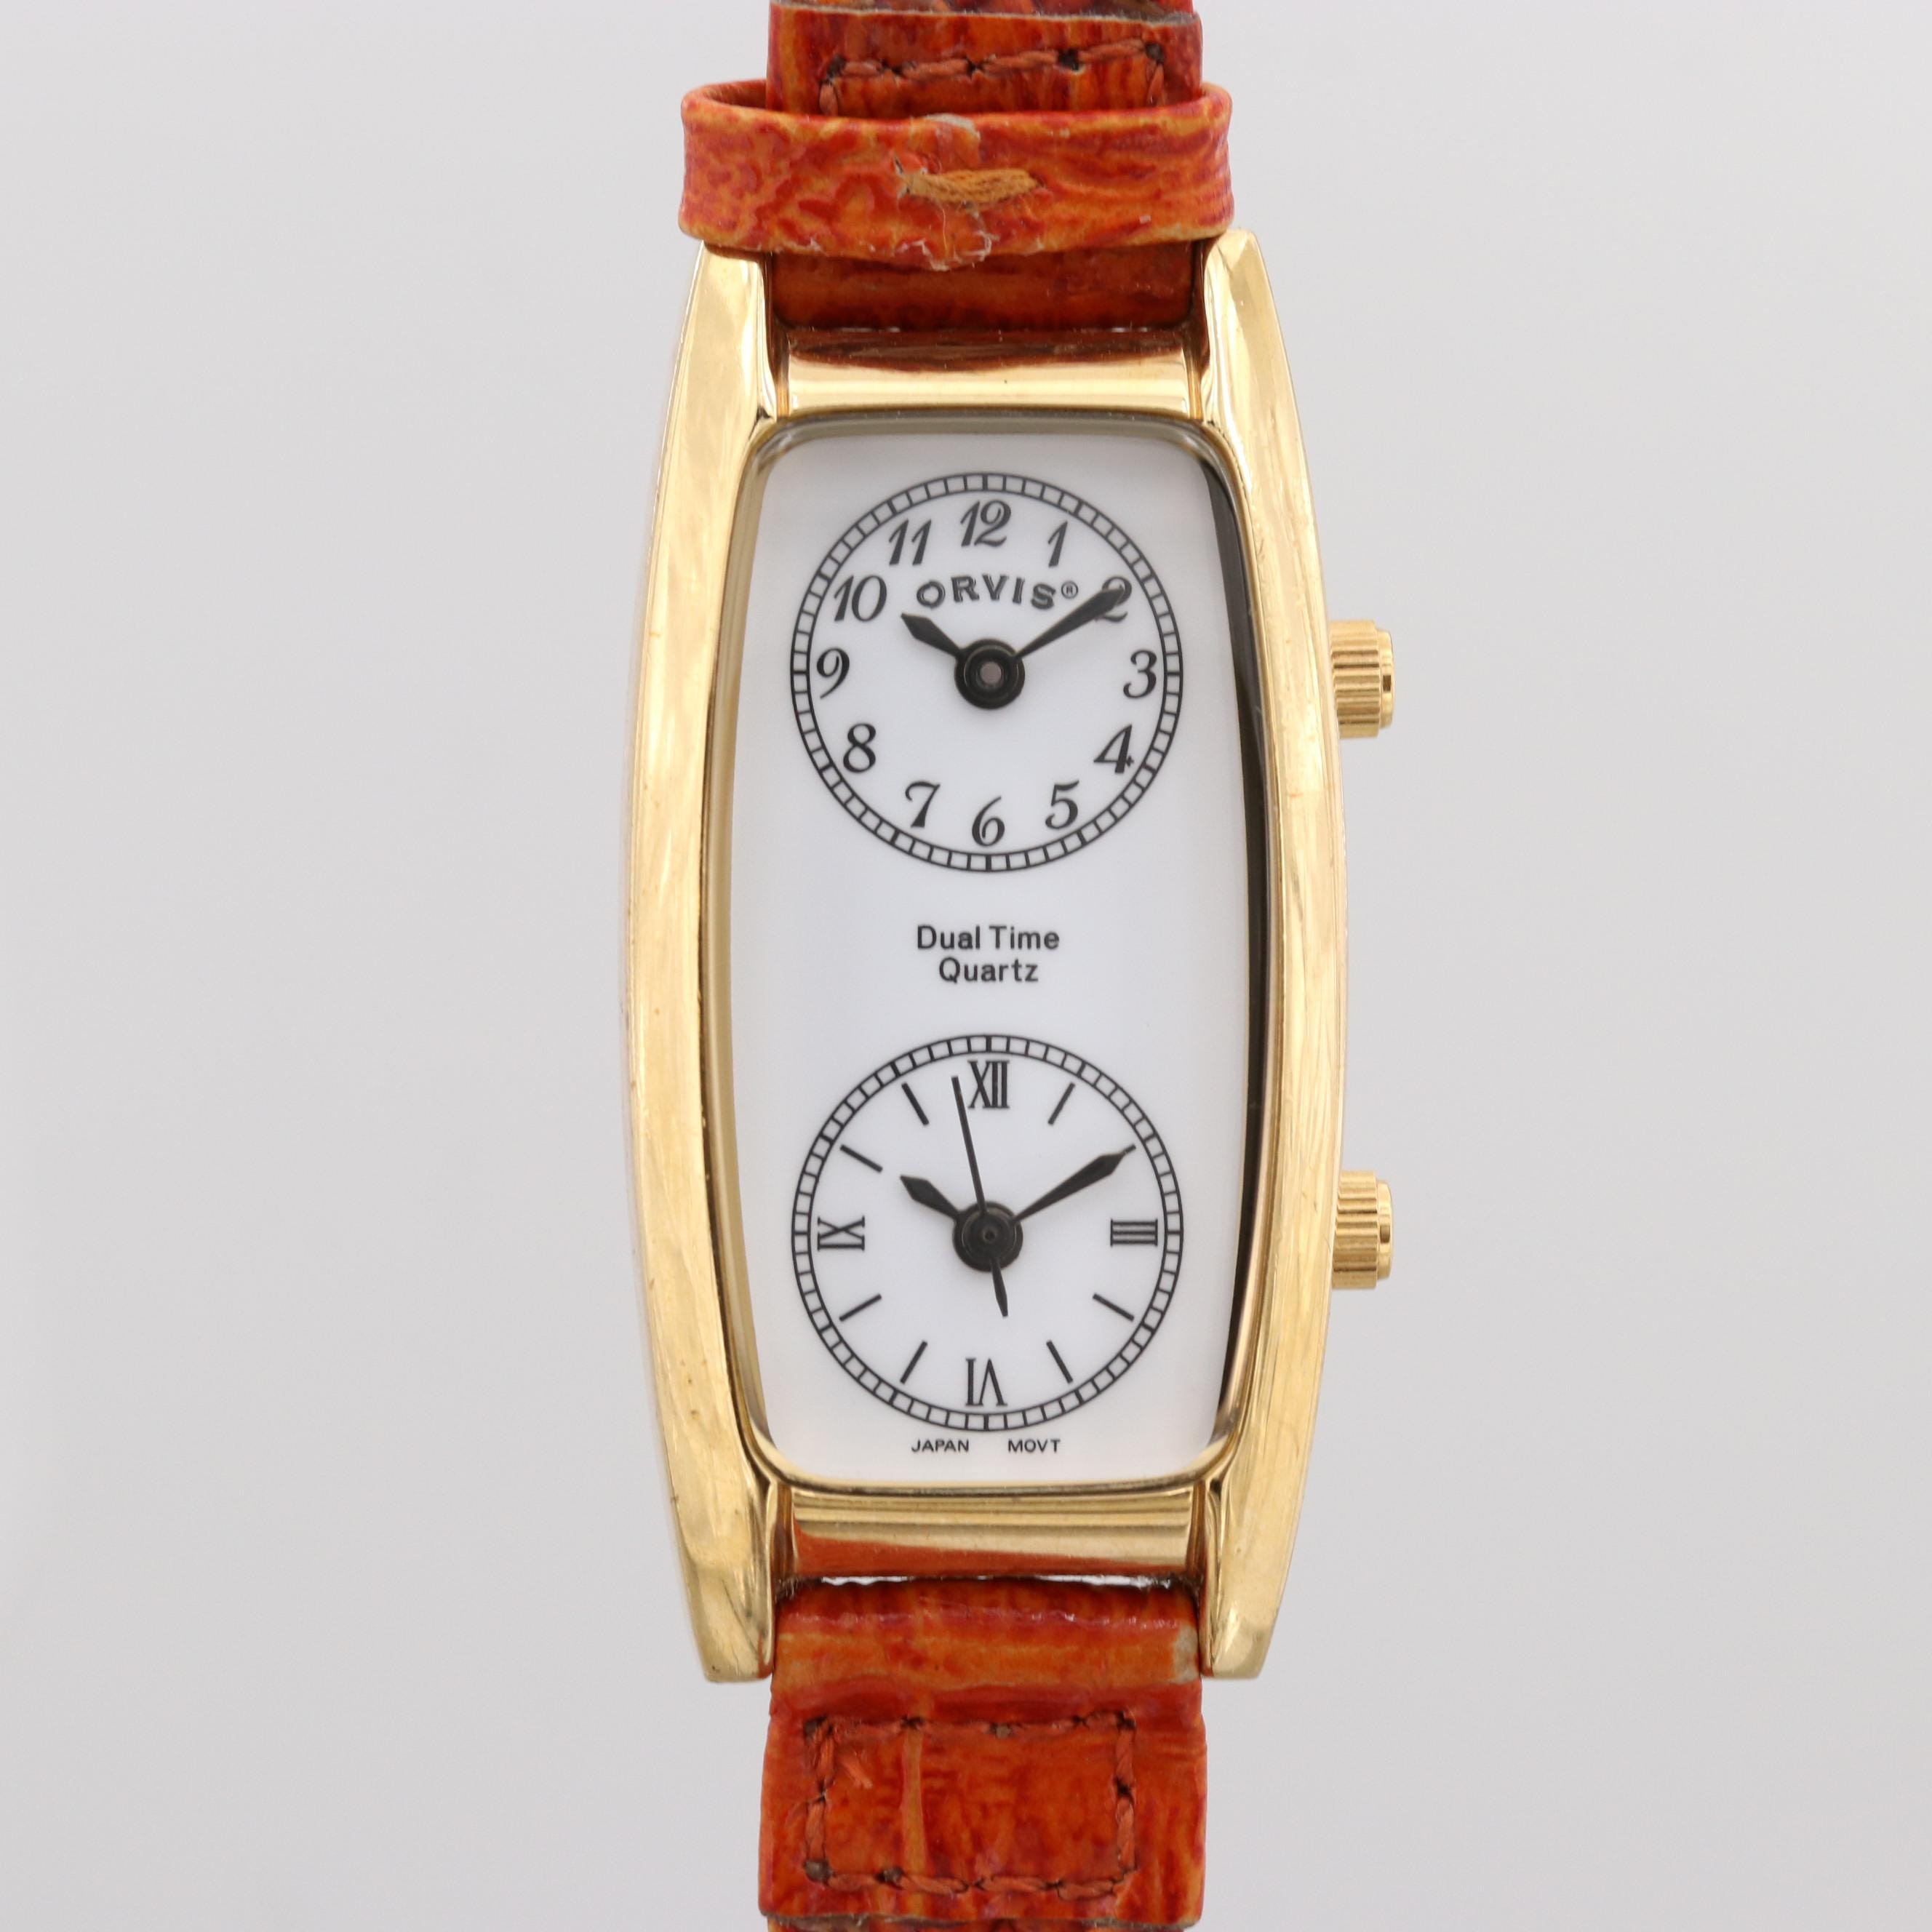 Orvis Dual Time Wristwatch